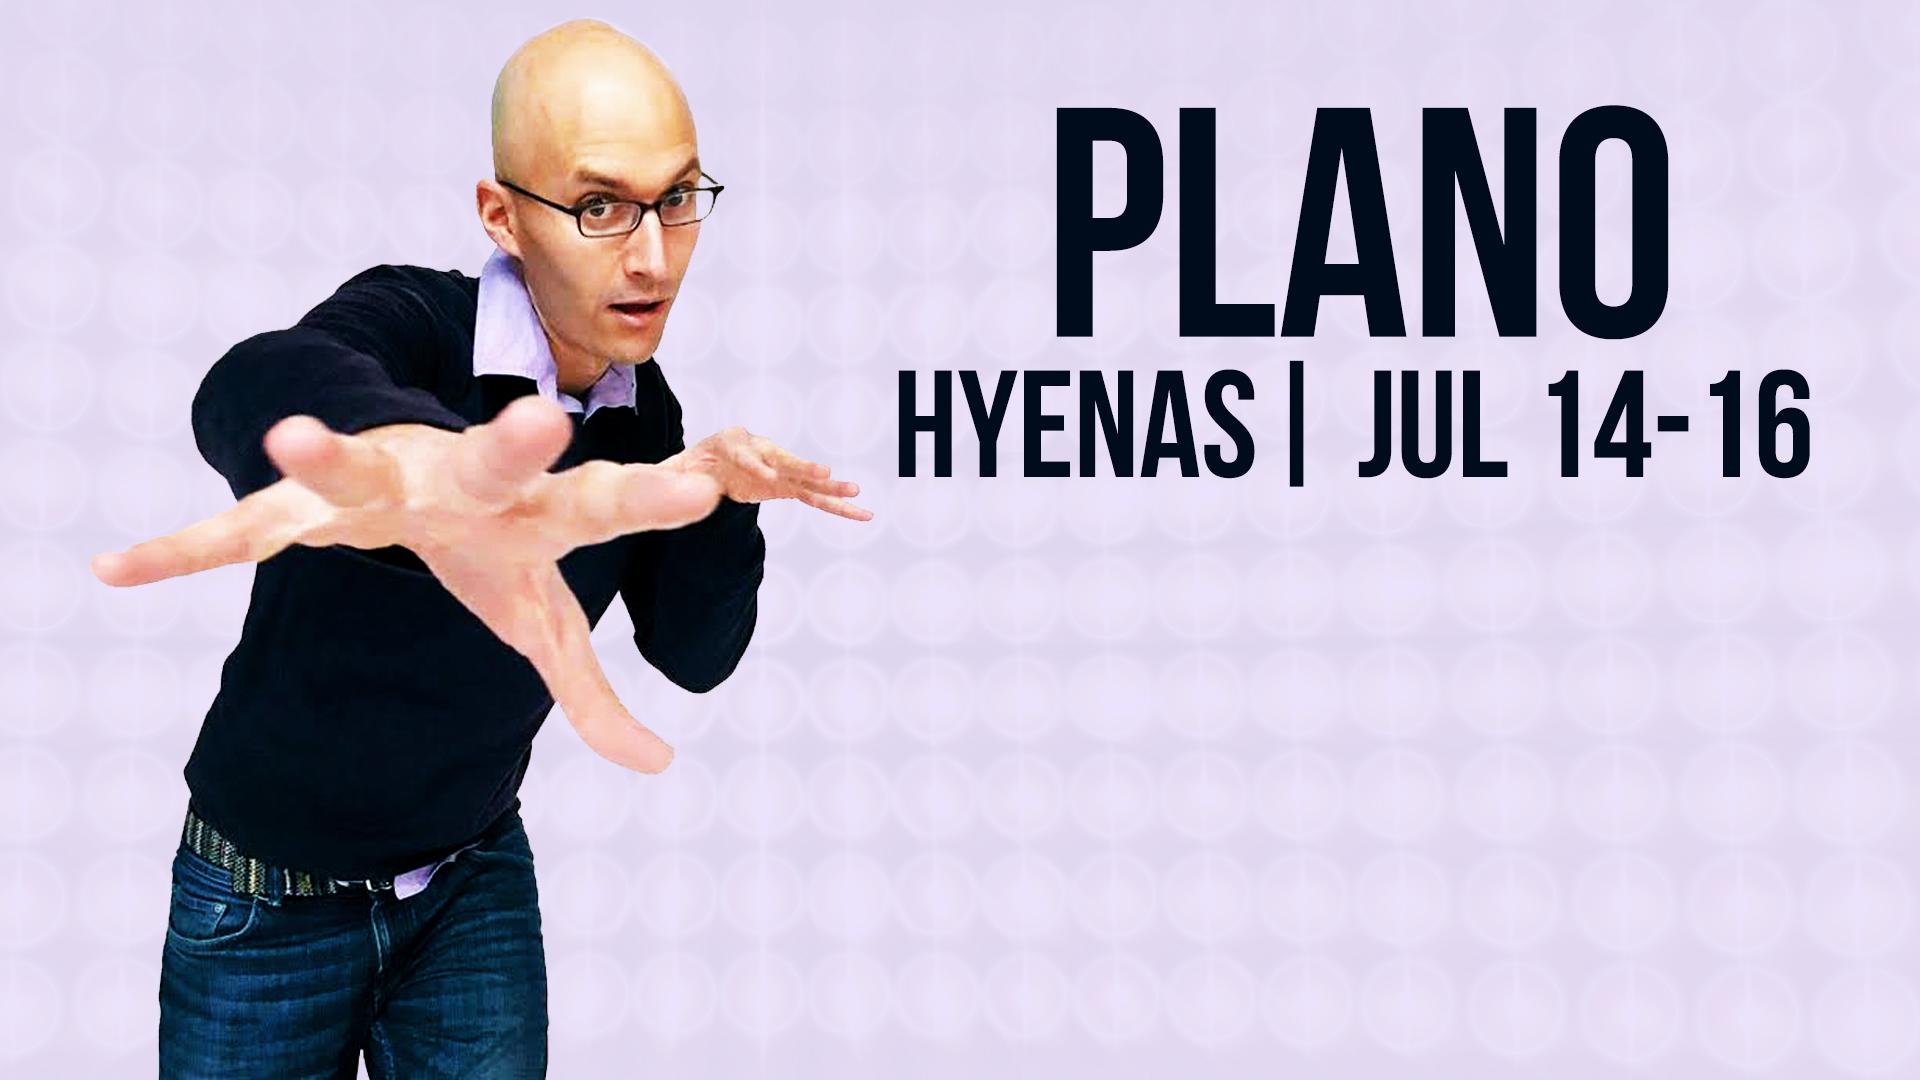 hyenas0716-plano